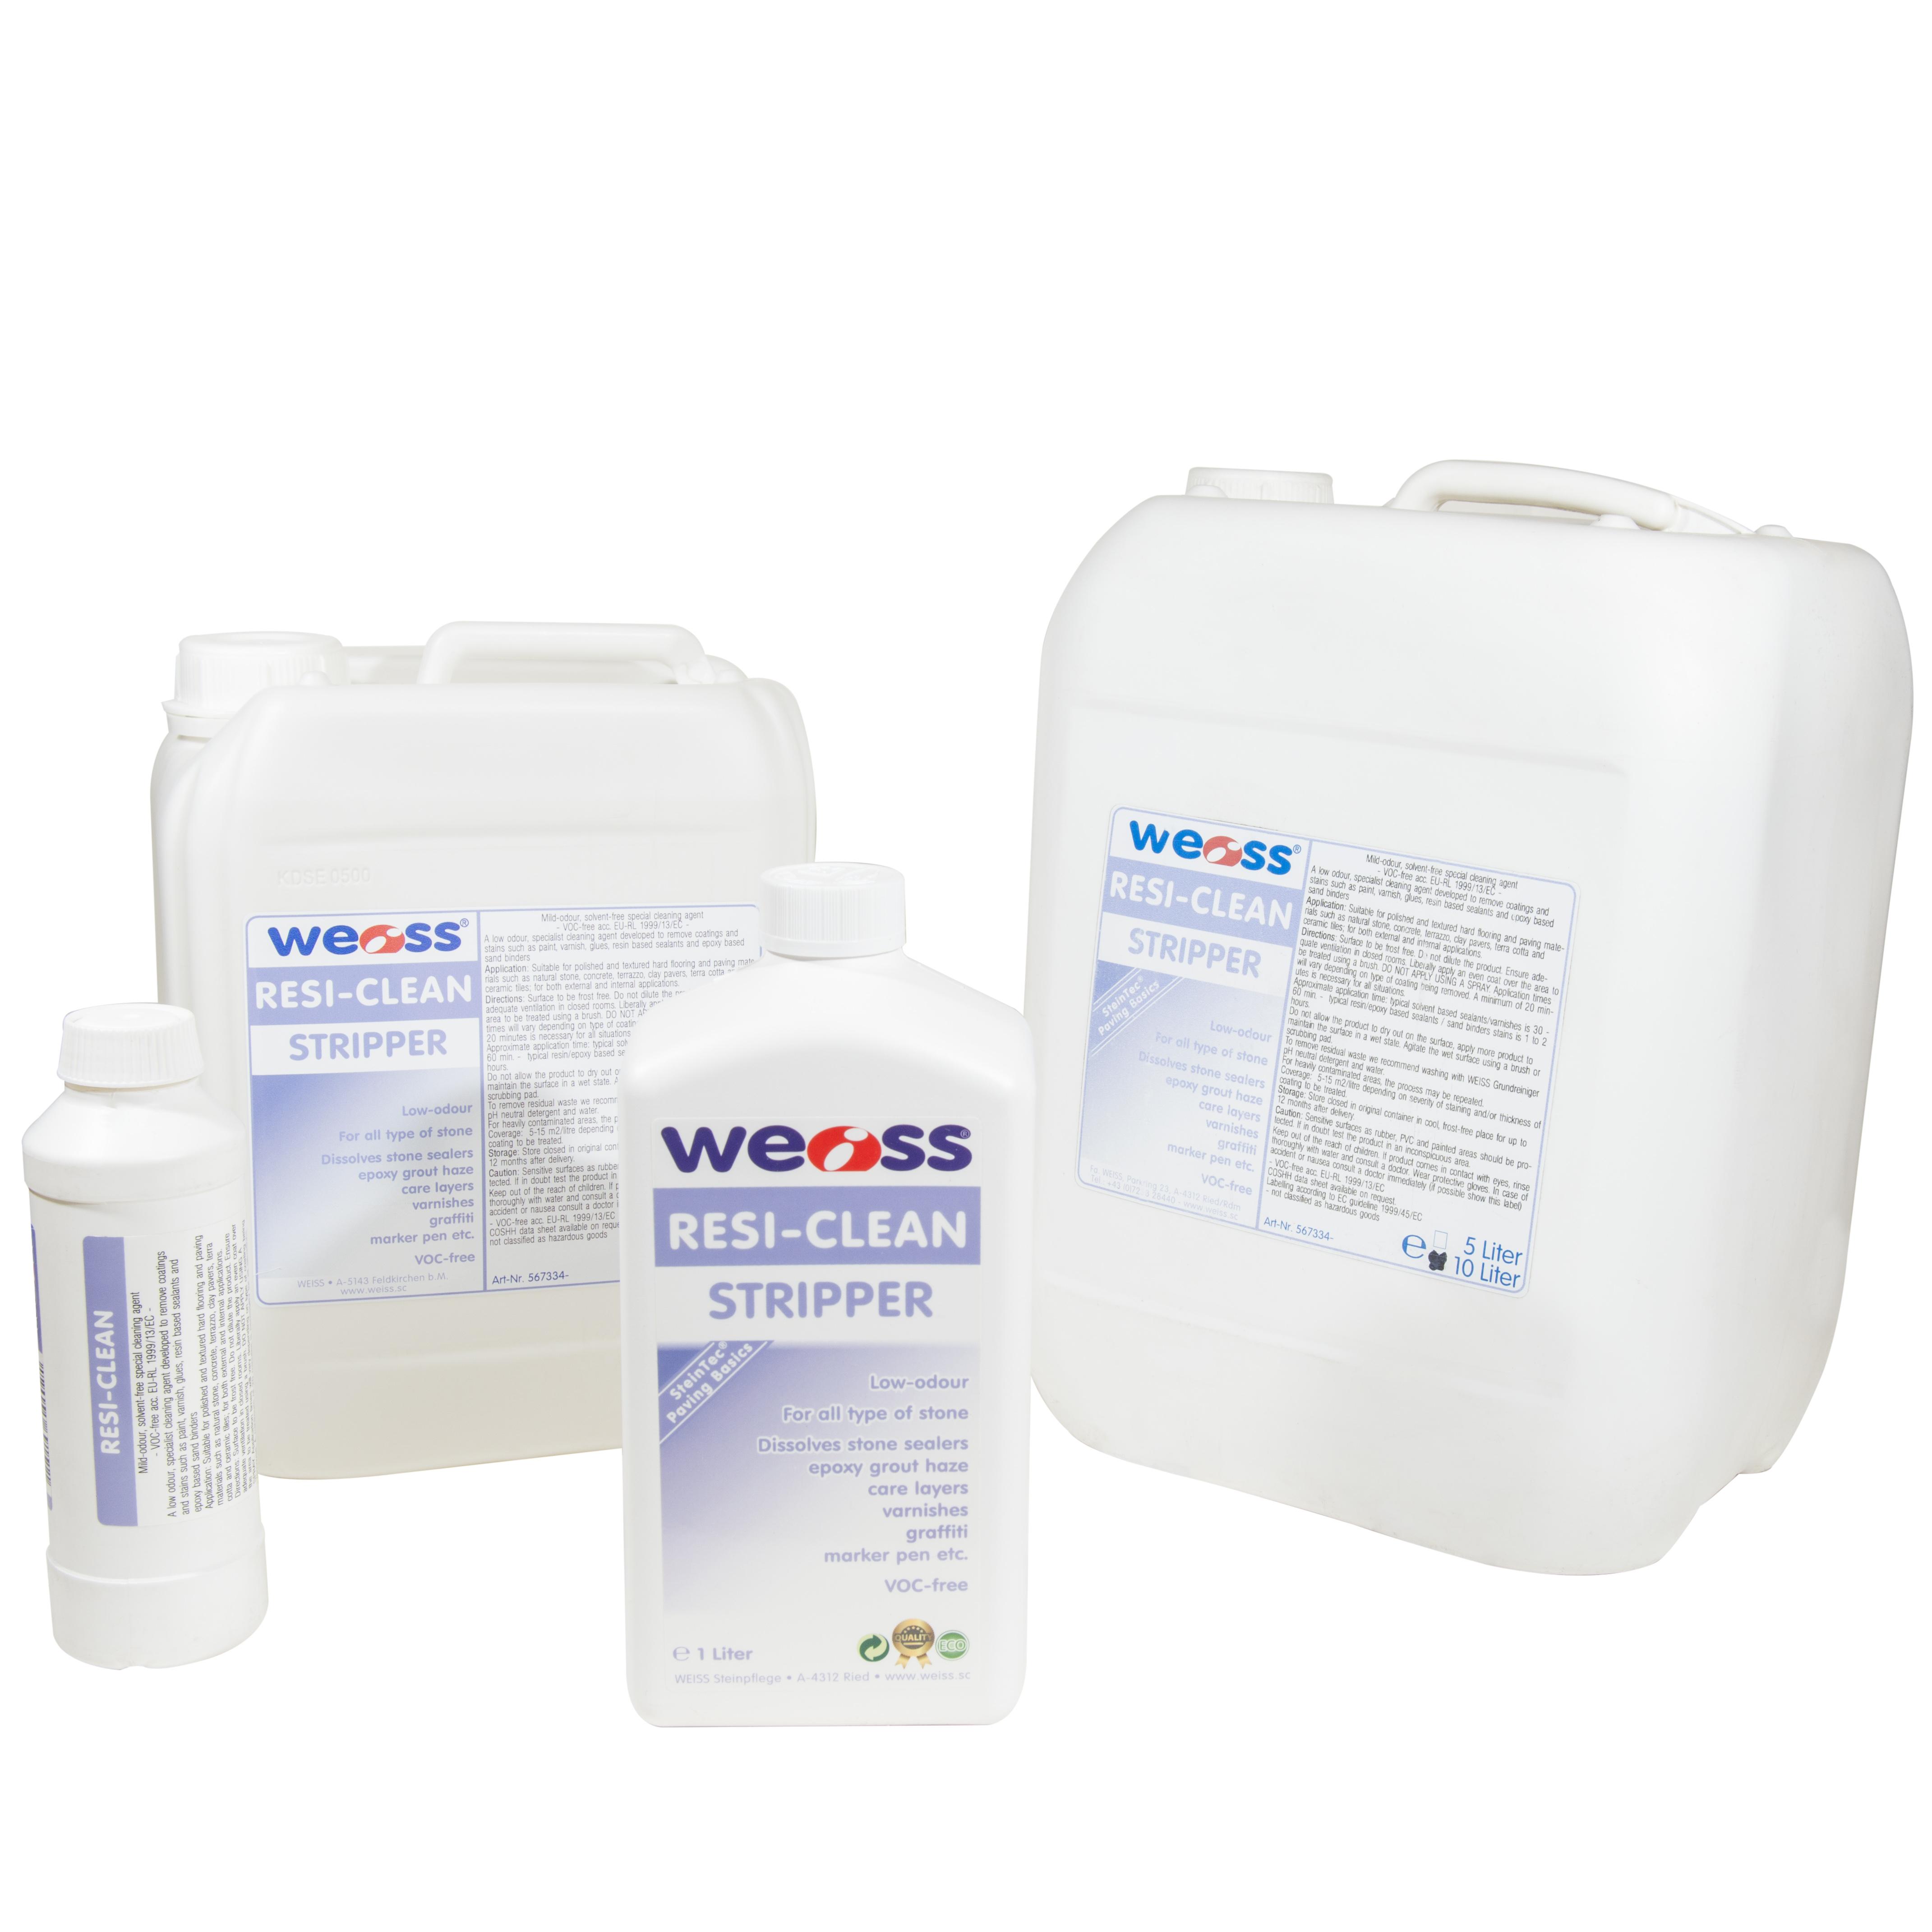 Weiss clean